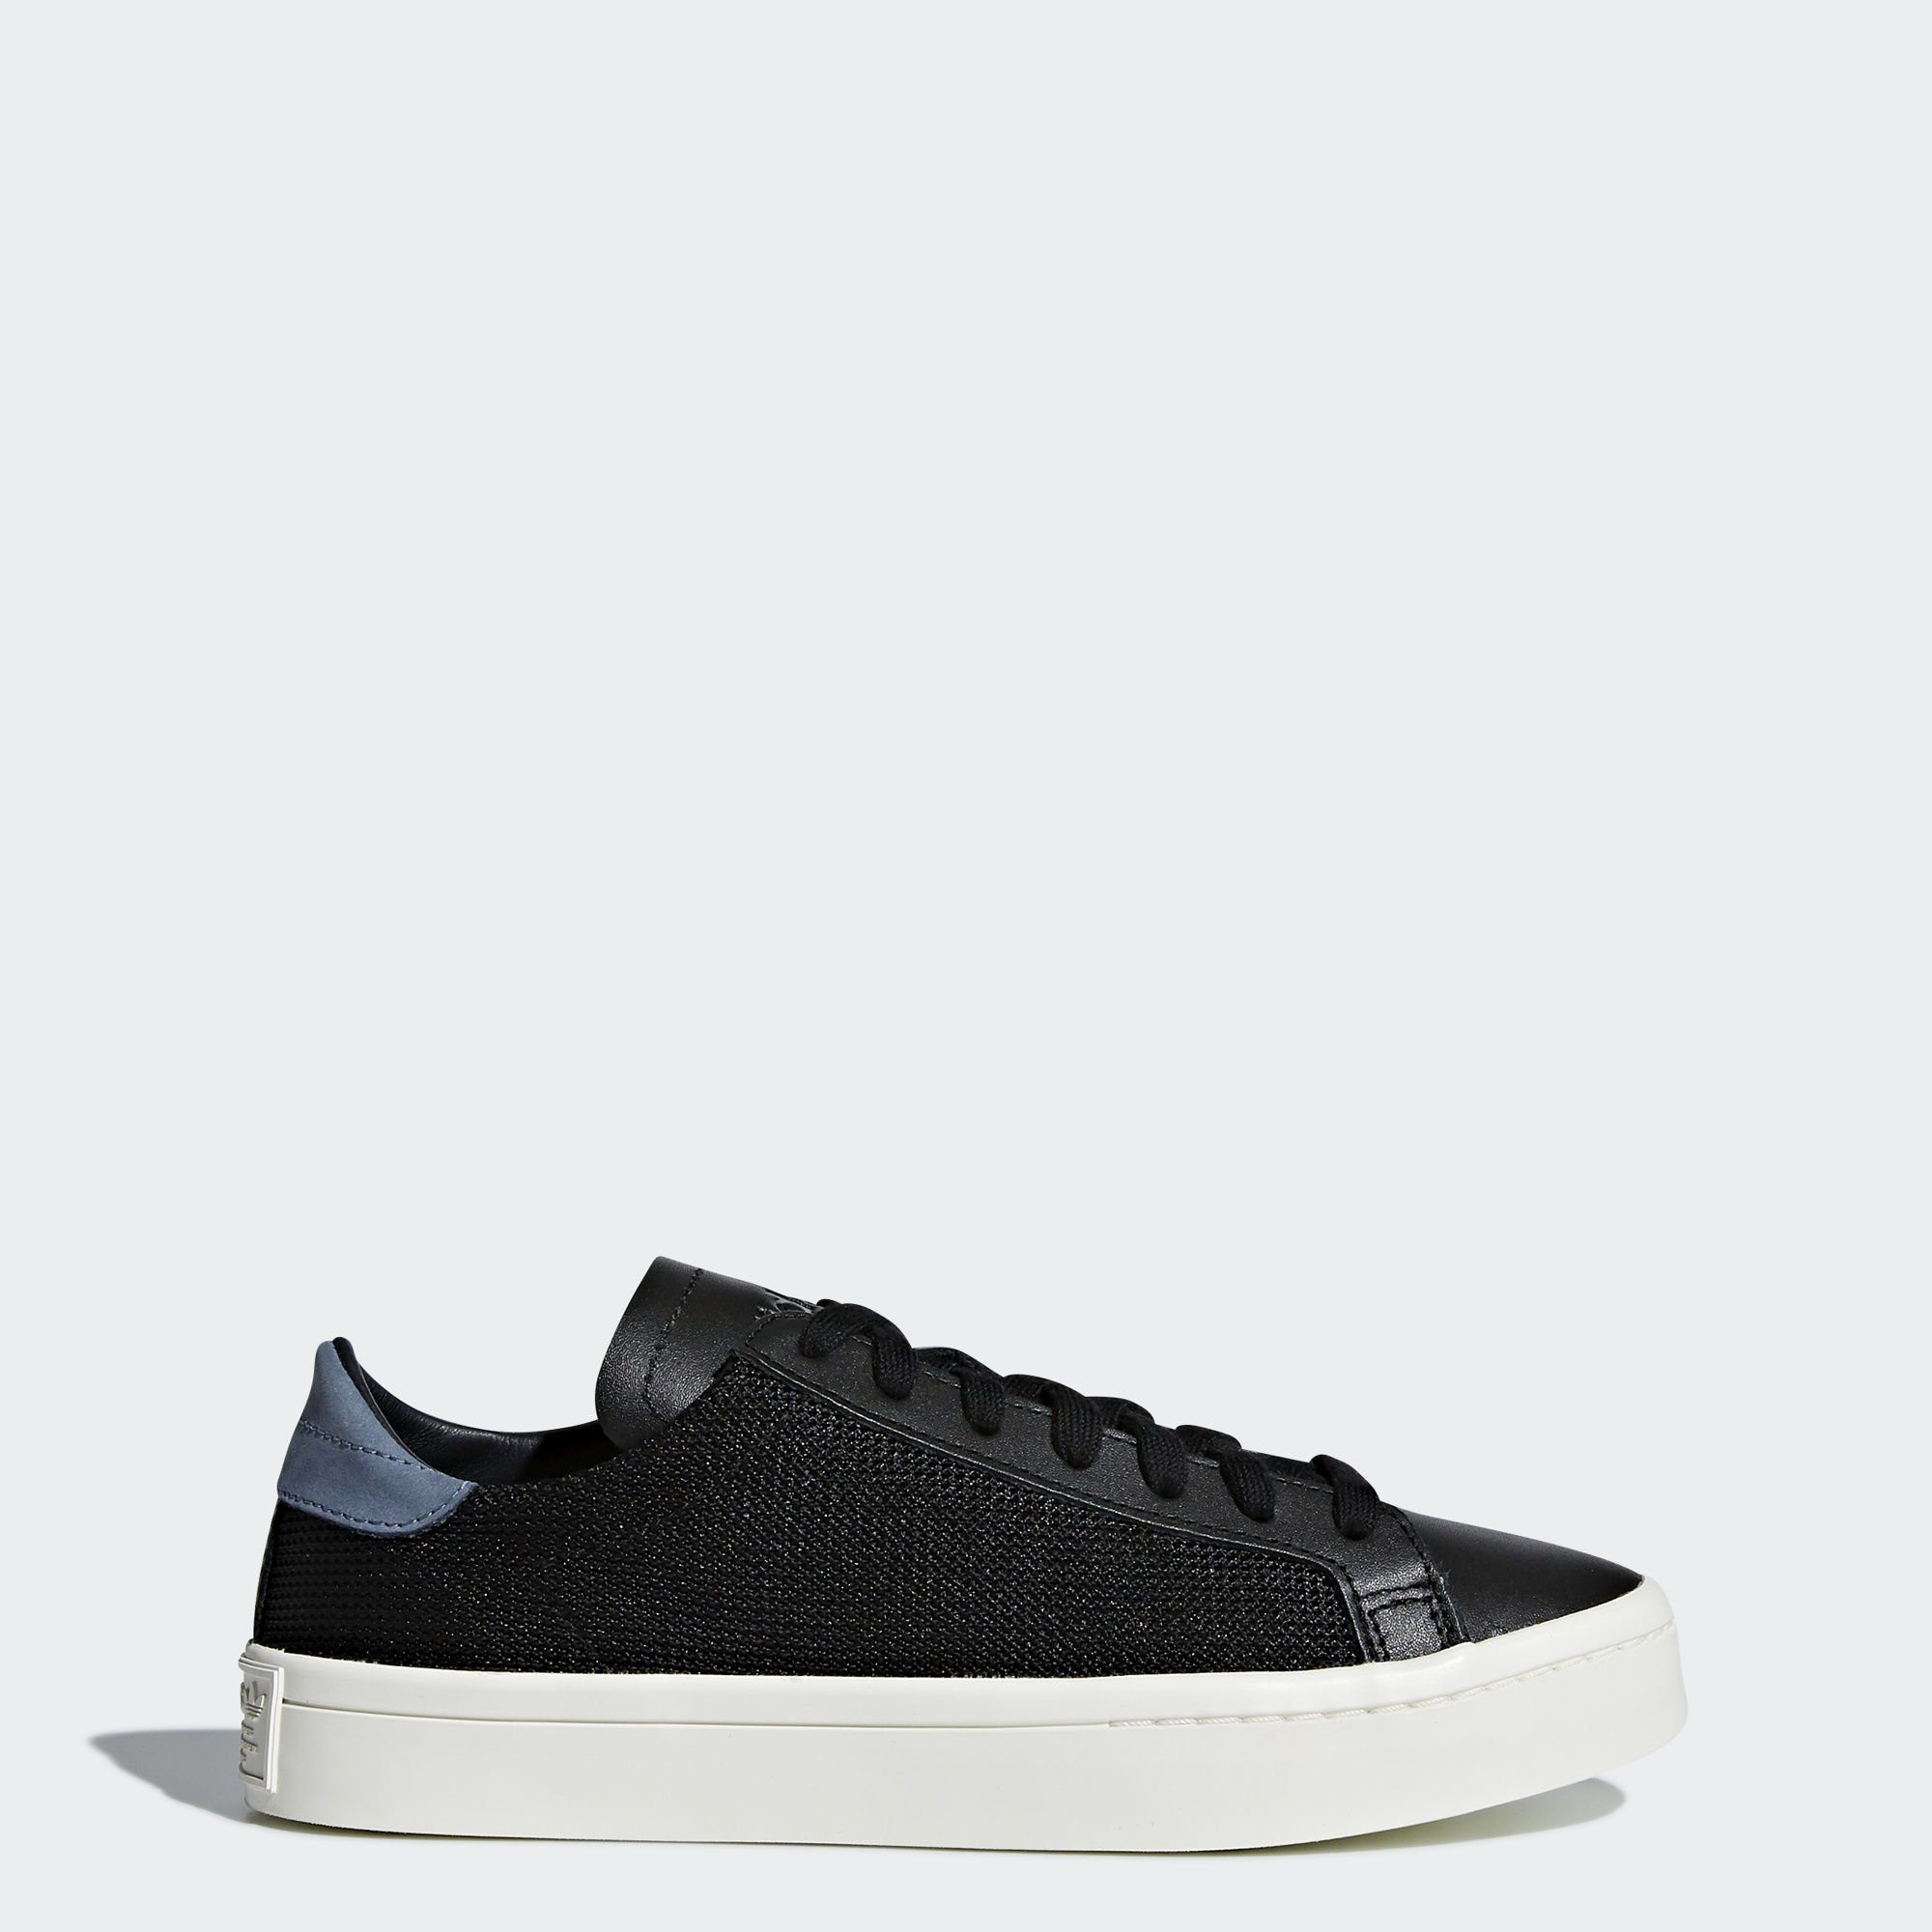 adidas Originals Court Vantage Schuh Sneaker  black